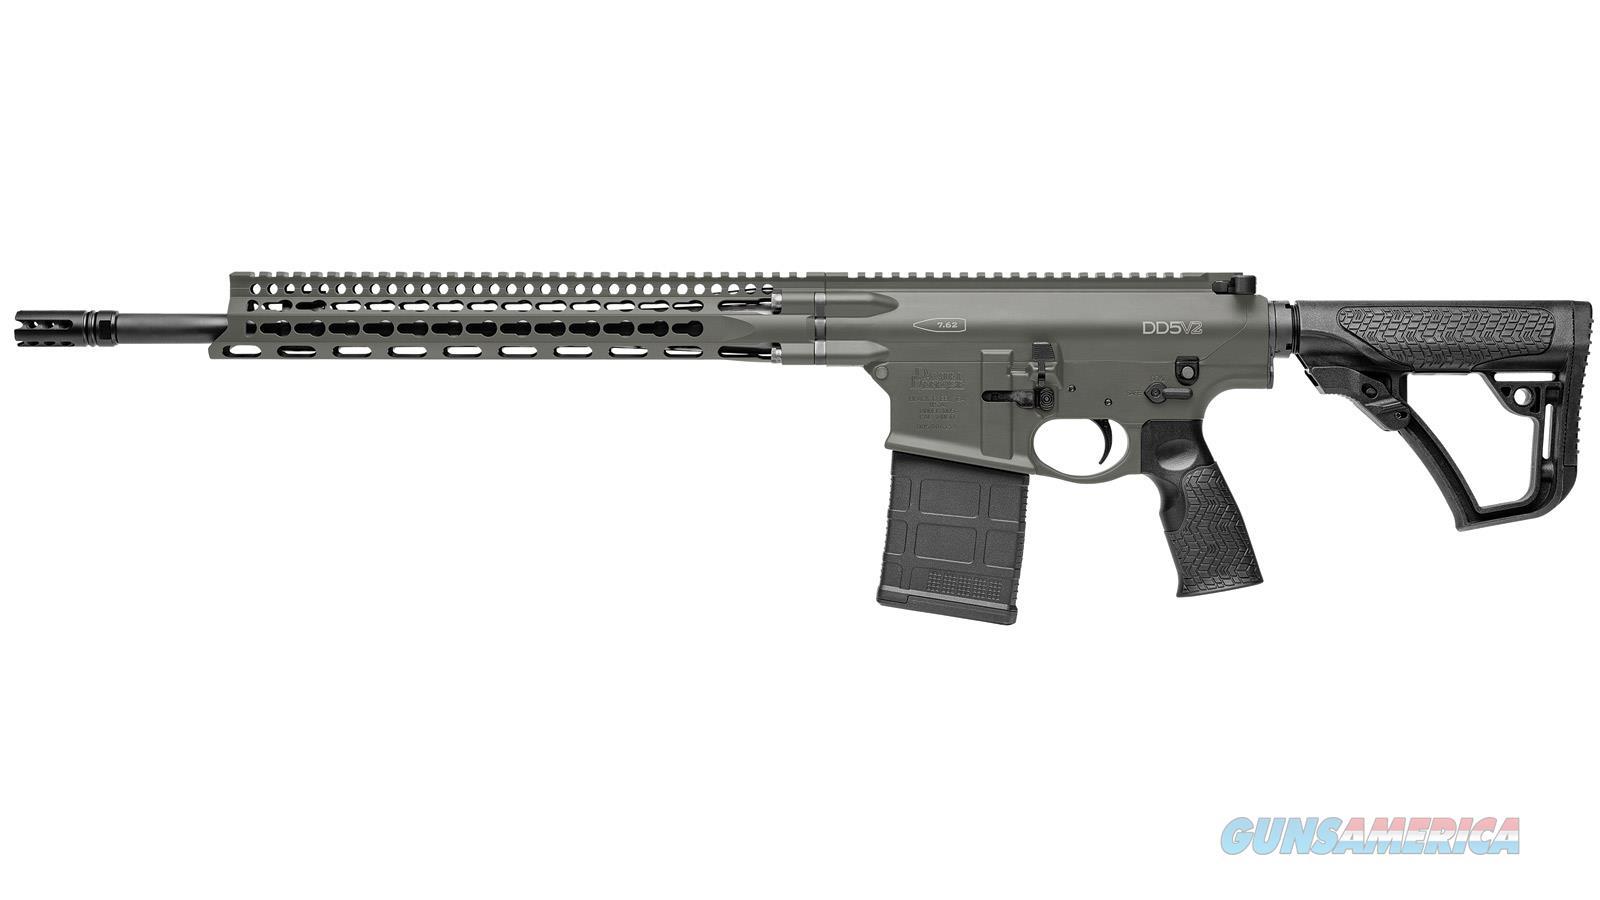 "Daniel Defense Dd5v2 7.62Mm 18"" 20Rd 02-155-02048-047  Guns > Rifles > D Misc Rifles"